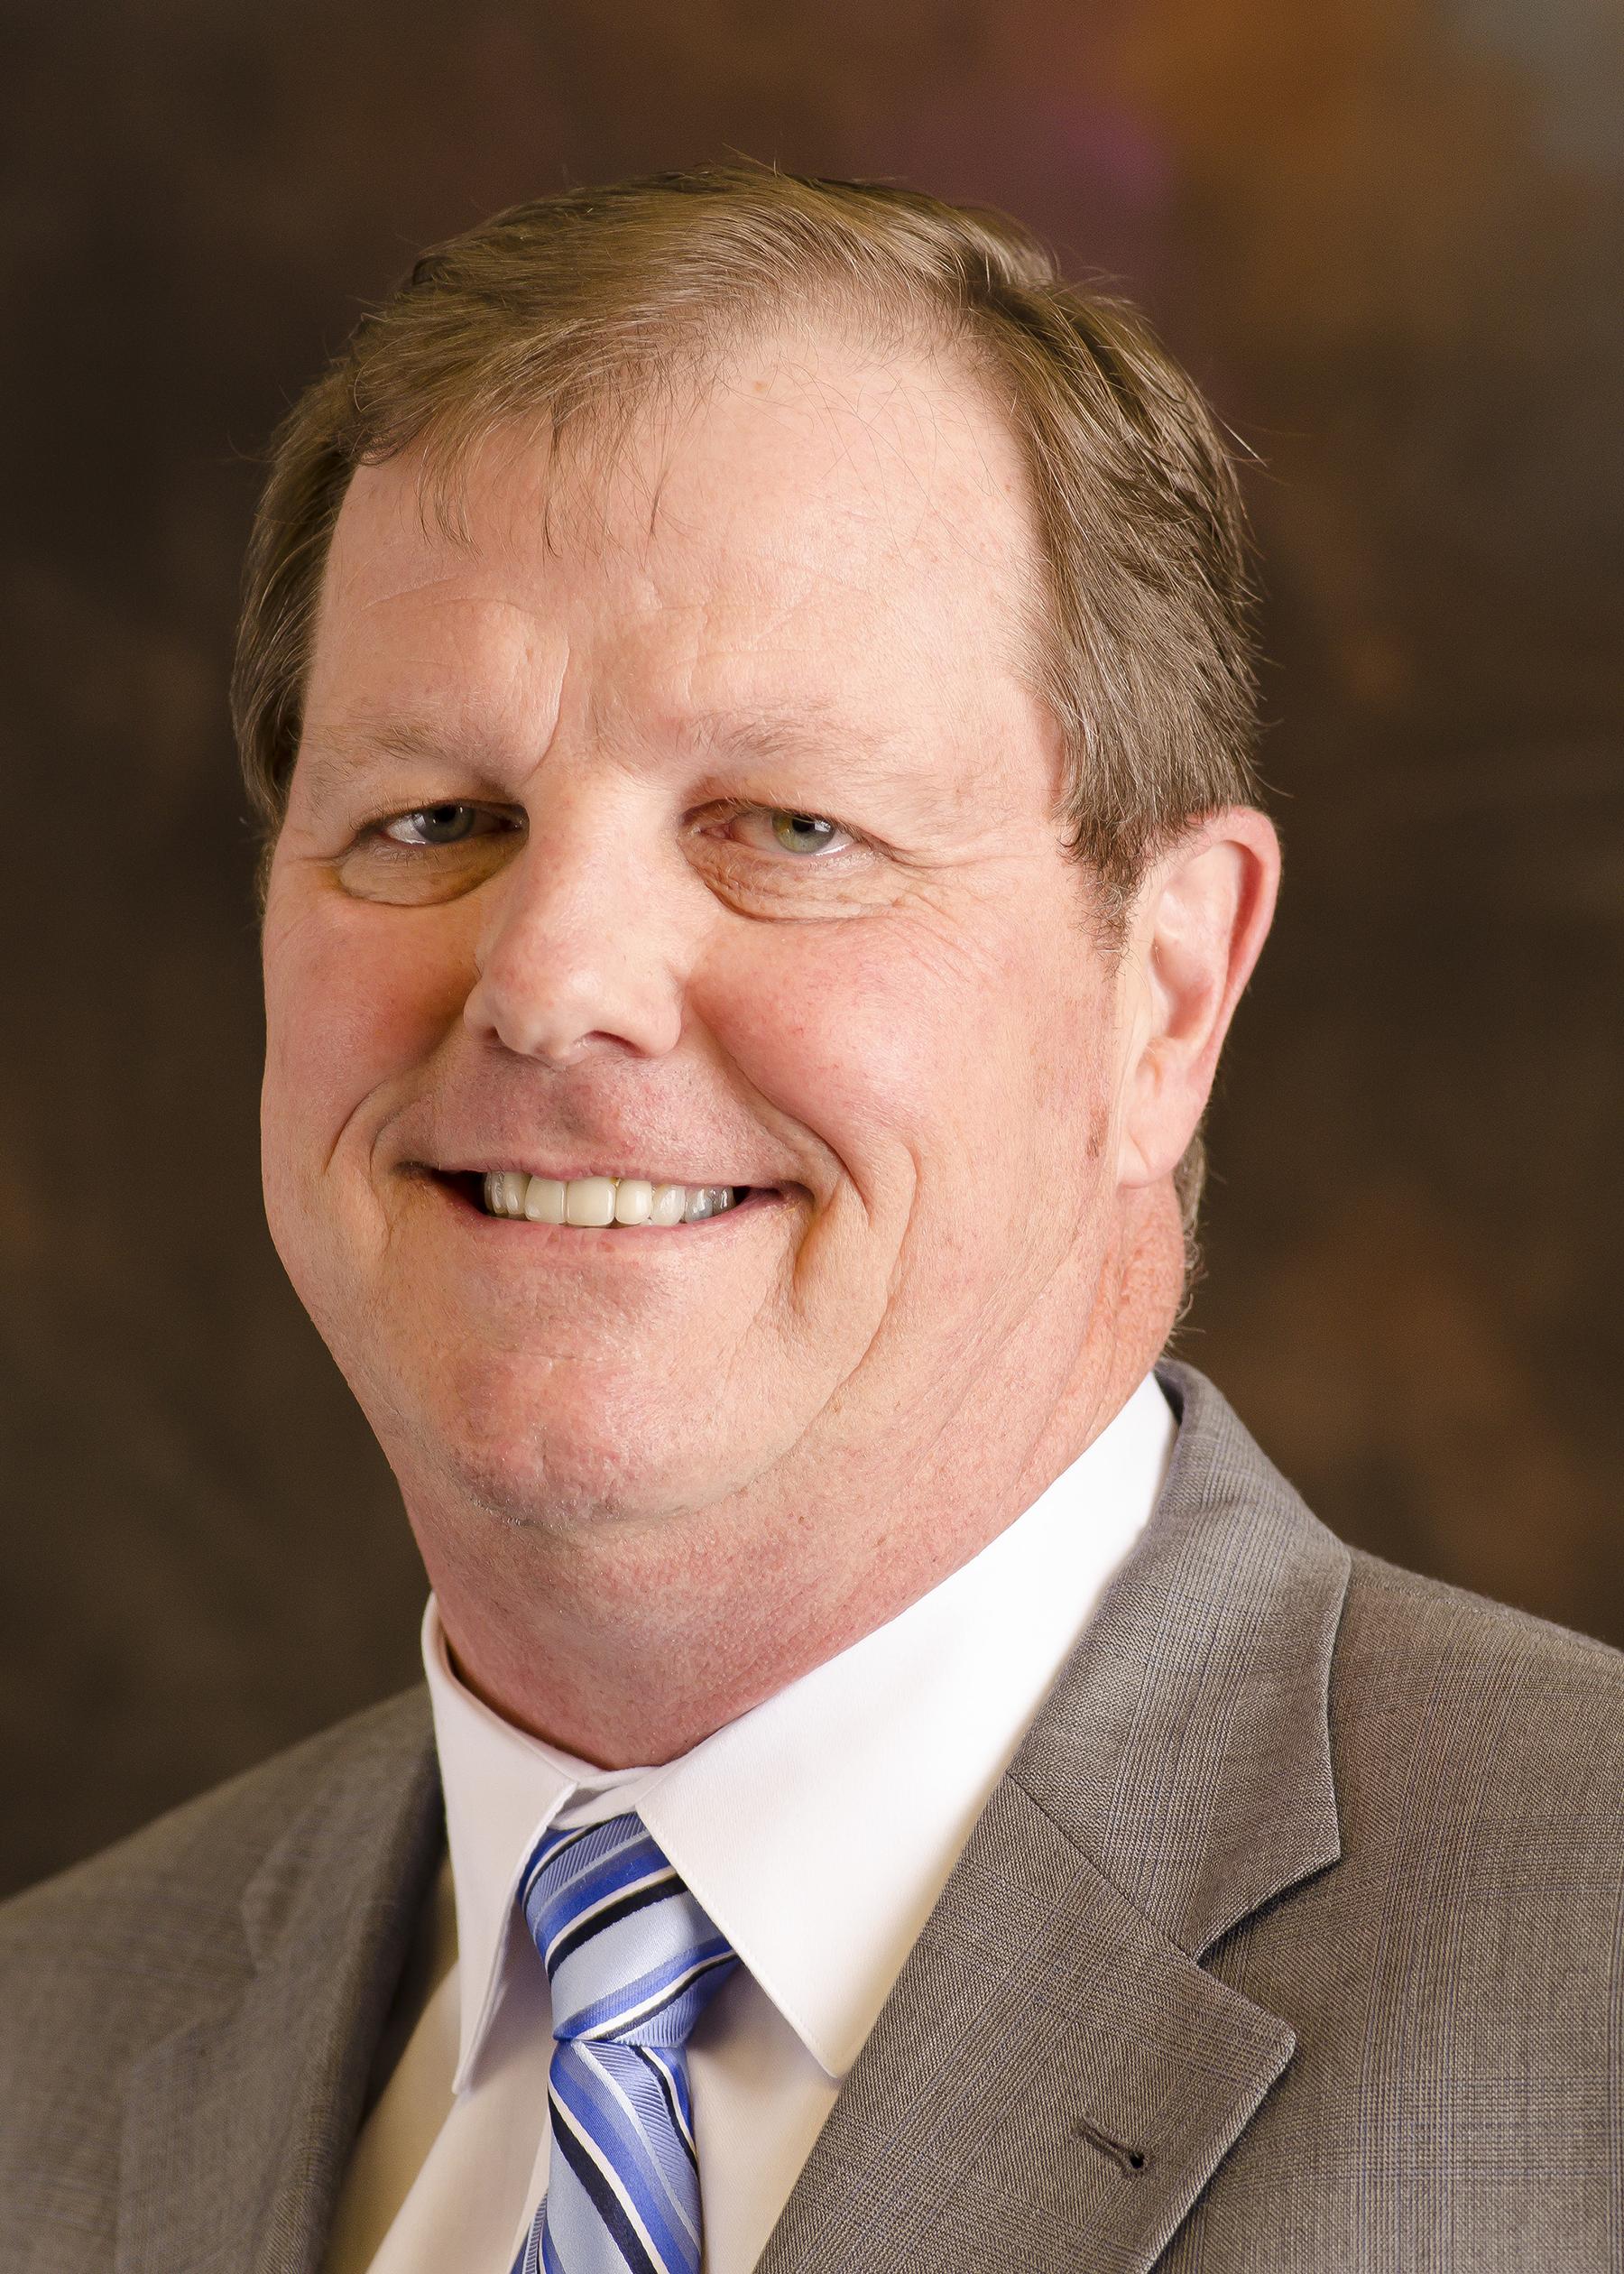 Atlanta GA executive headshot